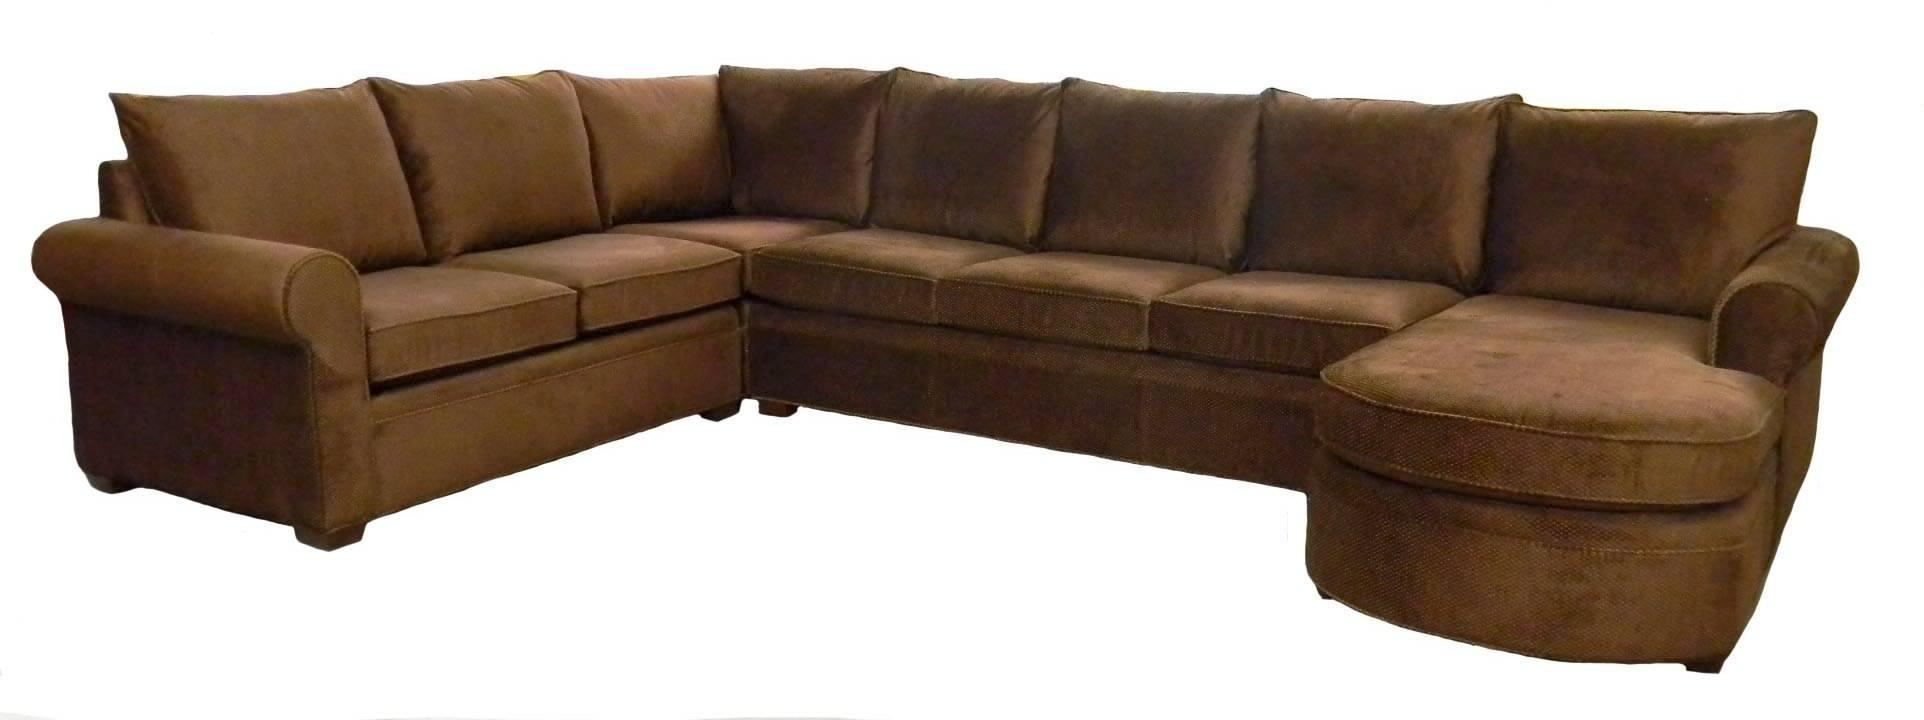 Leather Sectional Sofas Denver | Goodca Sofa Inside Denver Sectional (Image 9 of 15)